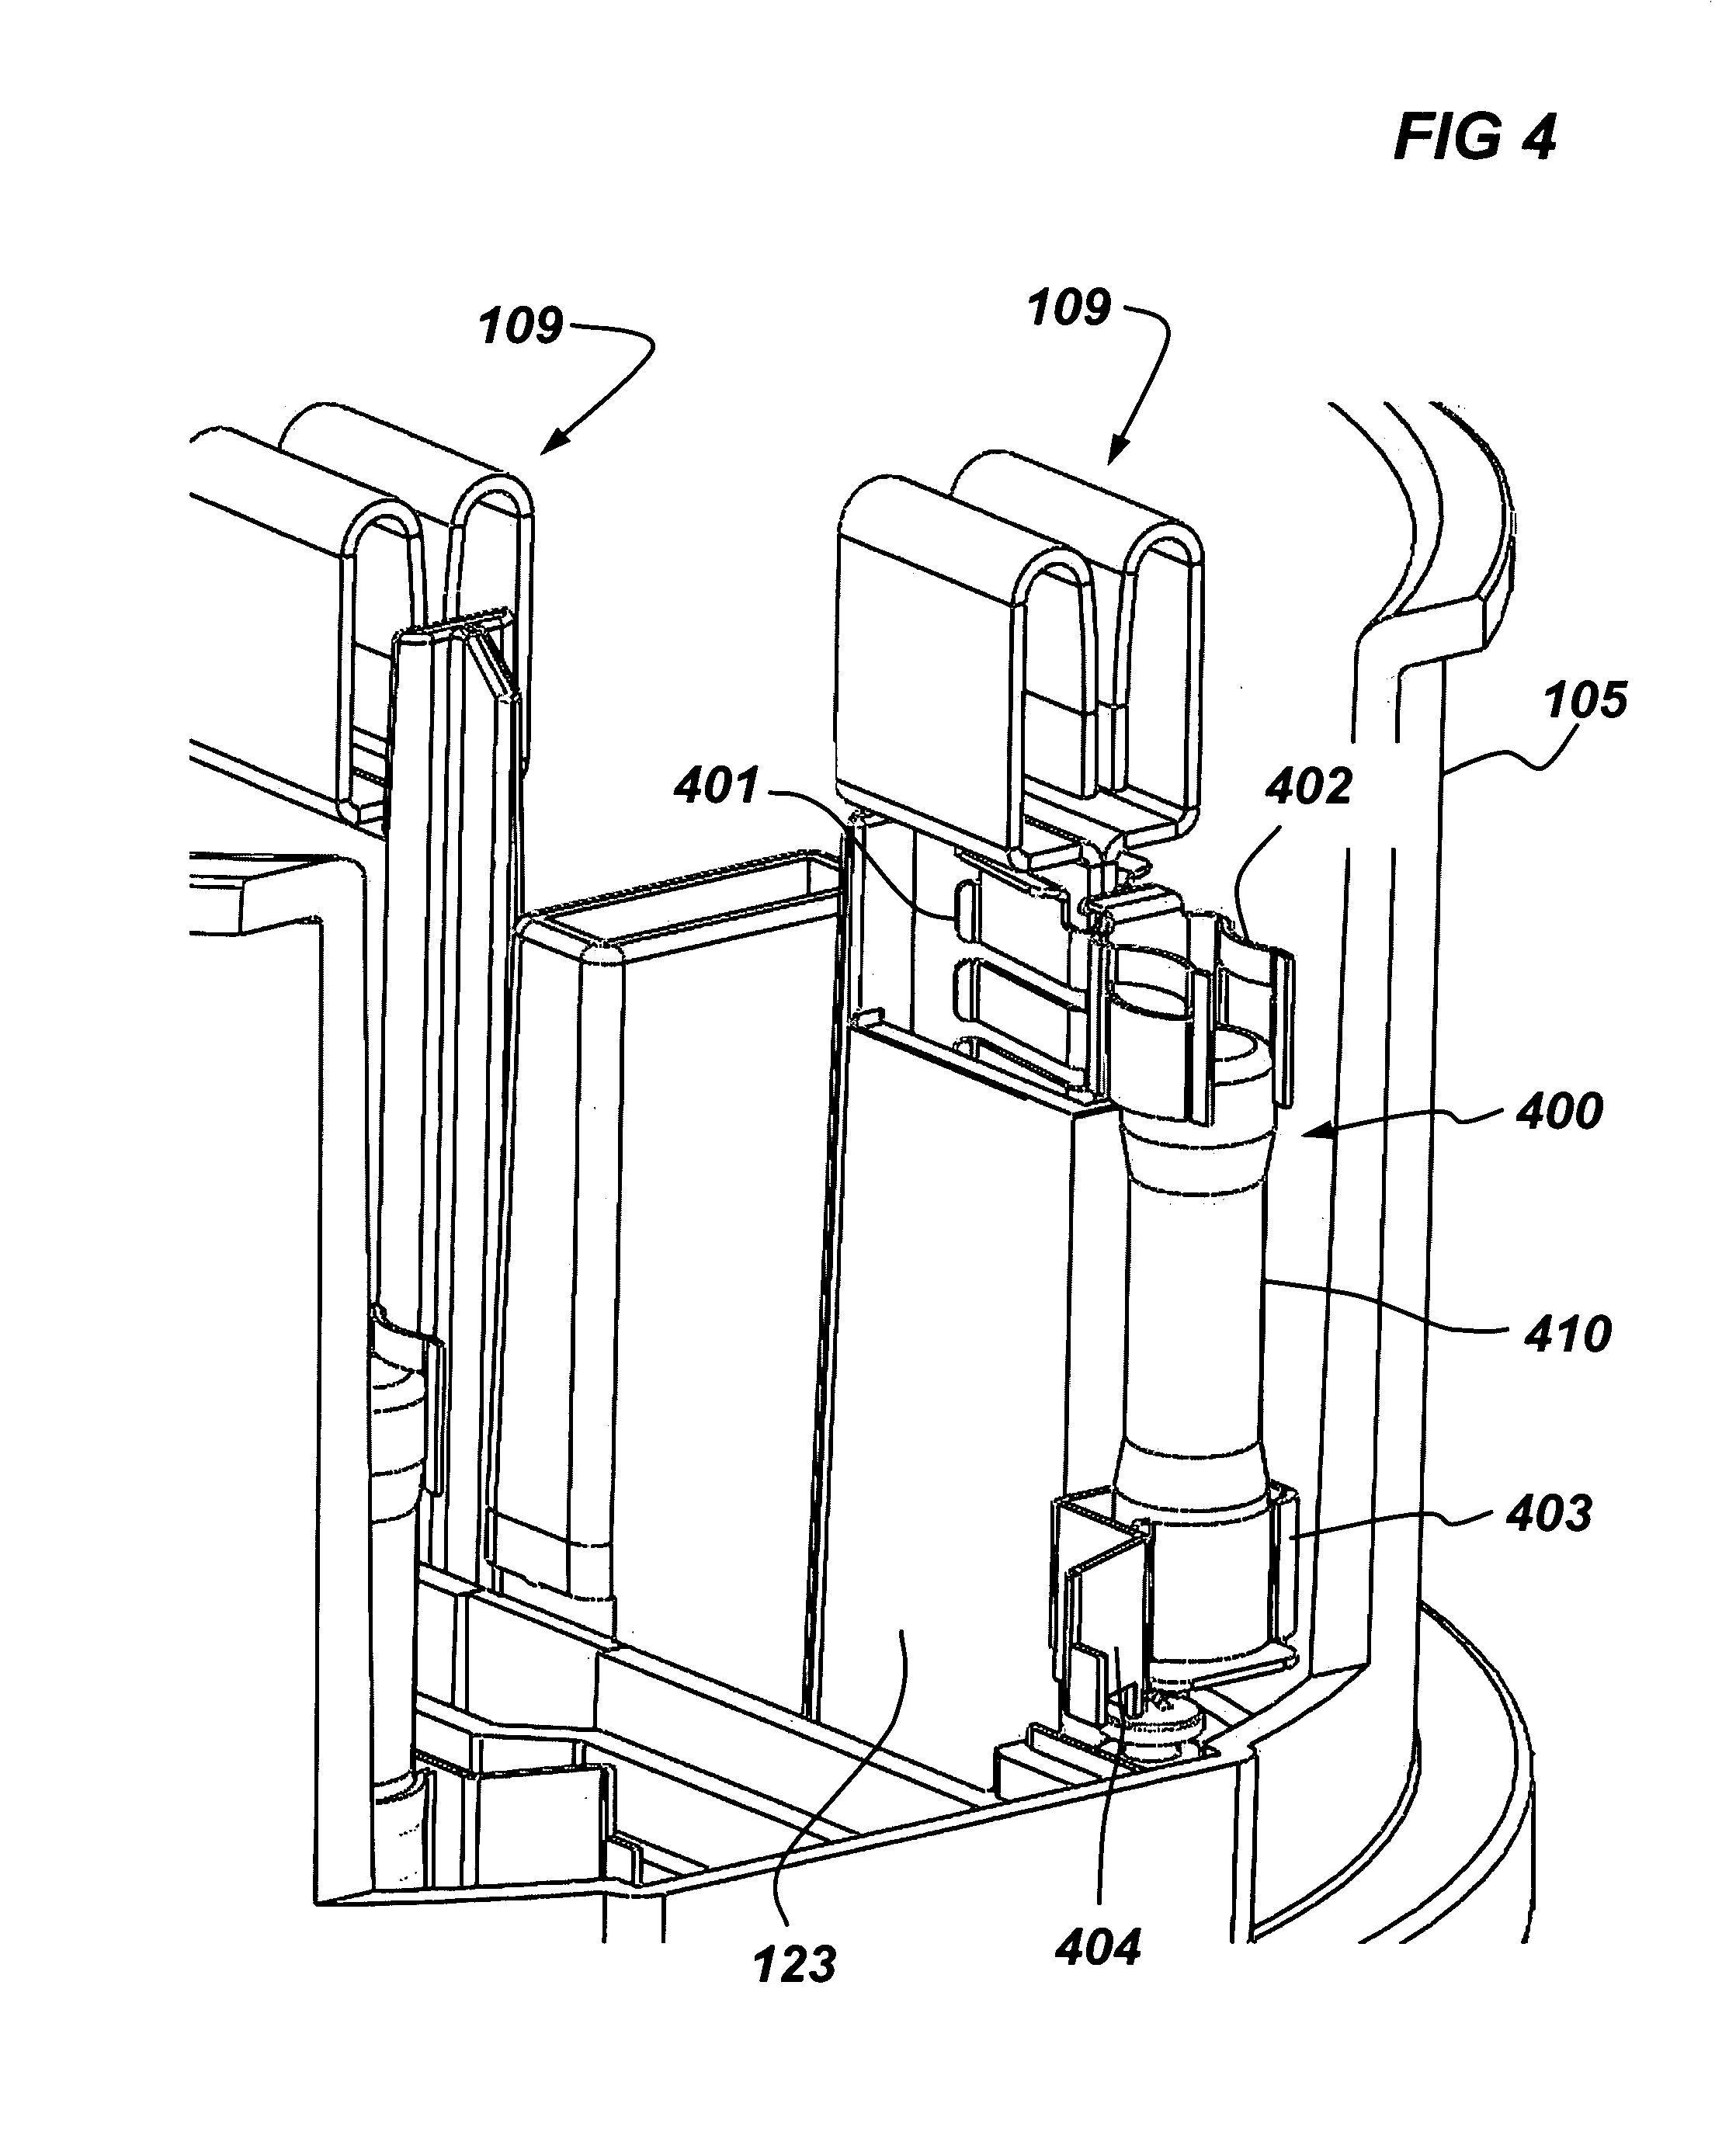 7 jaw meter socket wiring diagram parts of the globe theatre patente us20100323555 collar google patentes